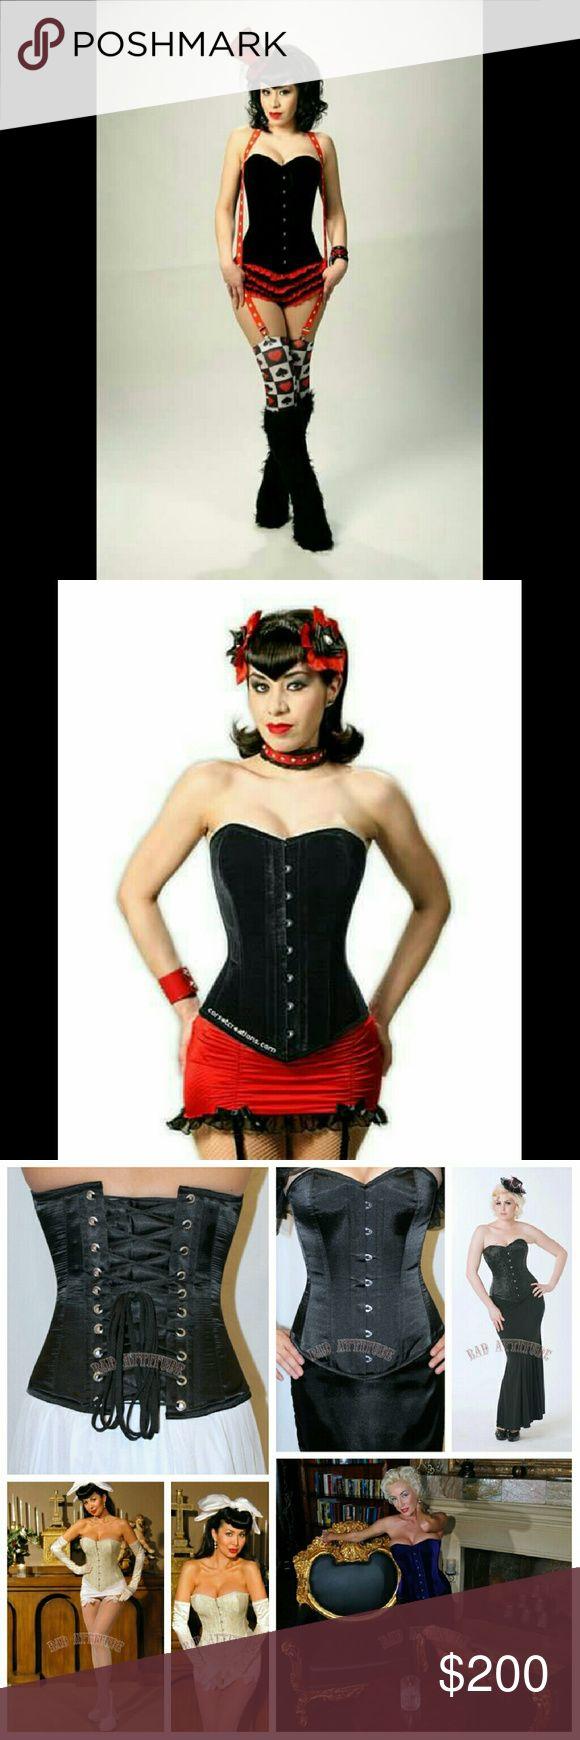 Clip zip waist trainer perfect floral design waist training cinchers - Corset Creations Katrina Black Velvet Corset